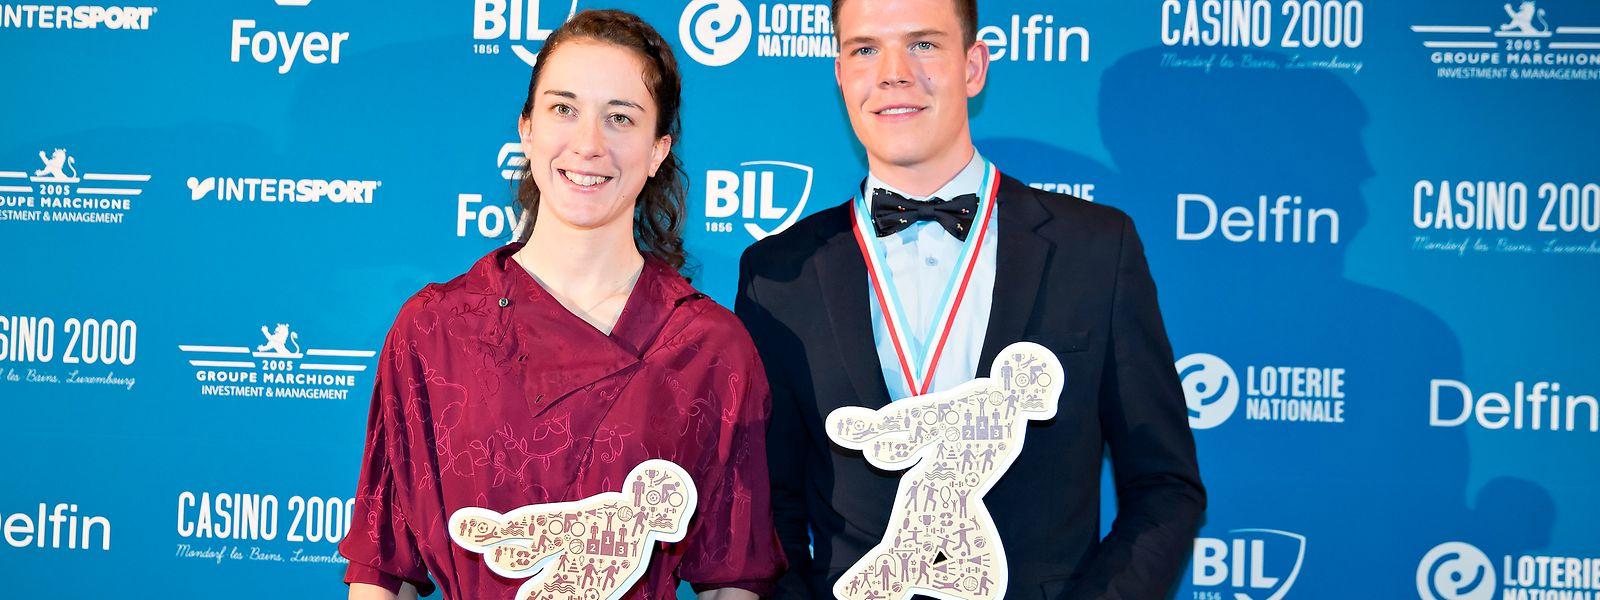 Christine Majerus und Bob Jungels / Sportspress Awards Night / Mondorf / 06.12.2018 / Foto: kuva